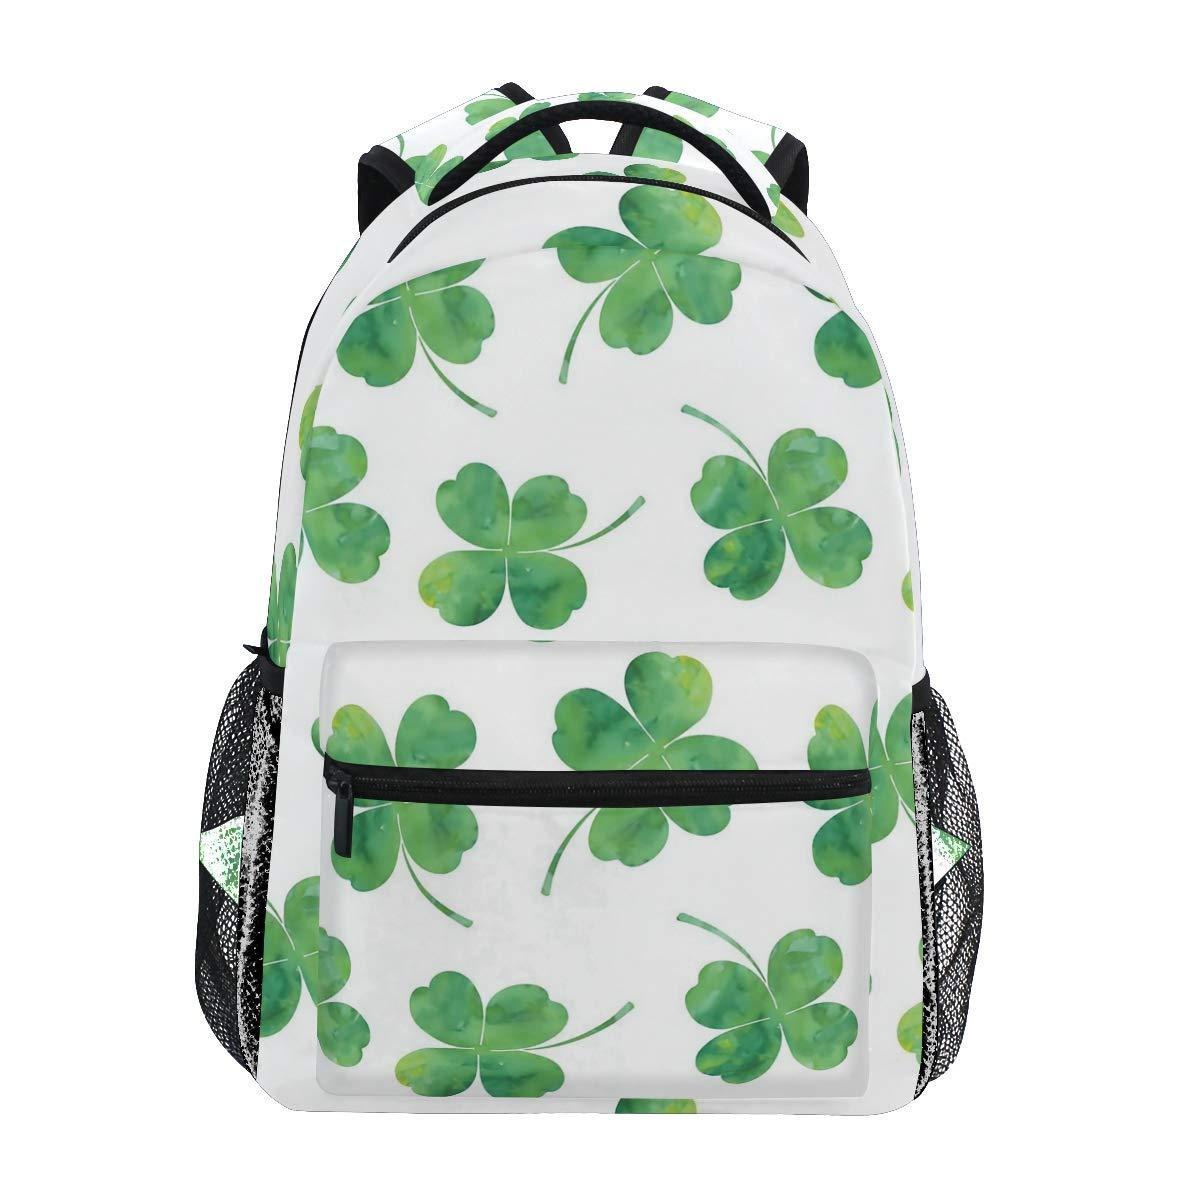 fbe7f67ff2bd Amazon.com: Four Leaf Clover Backpacks College School Book Bag ...